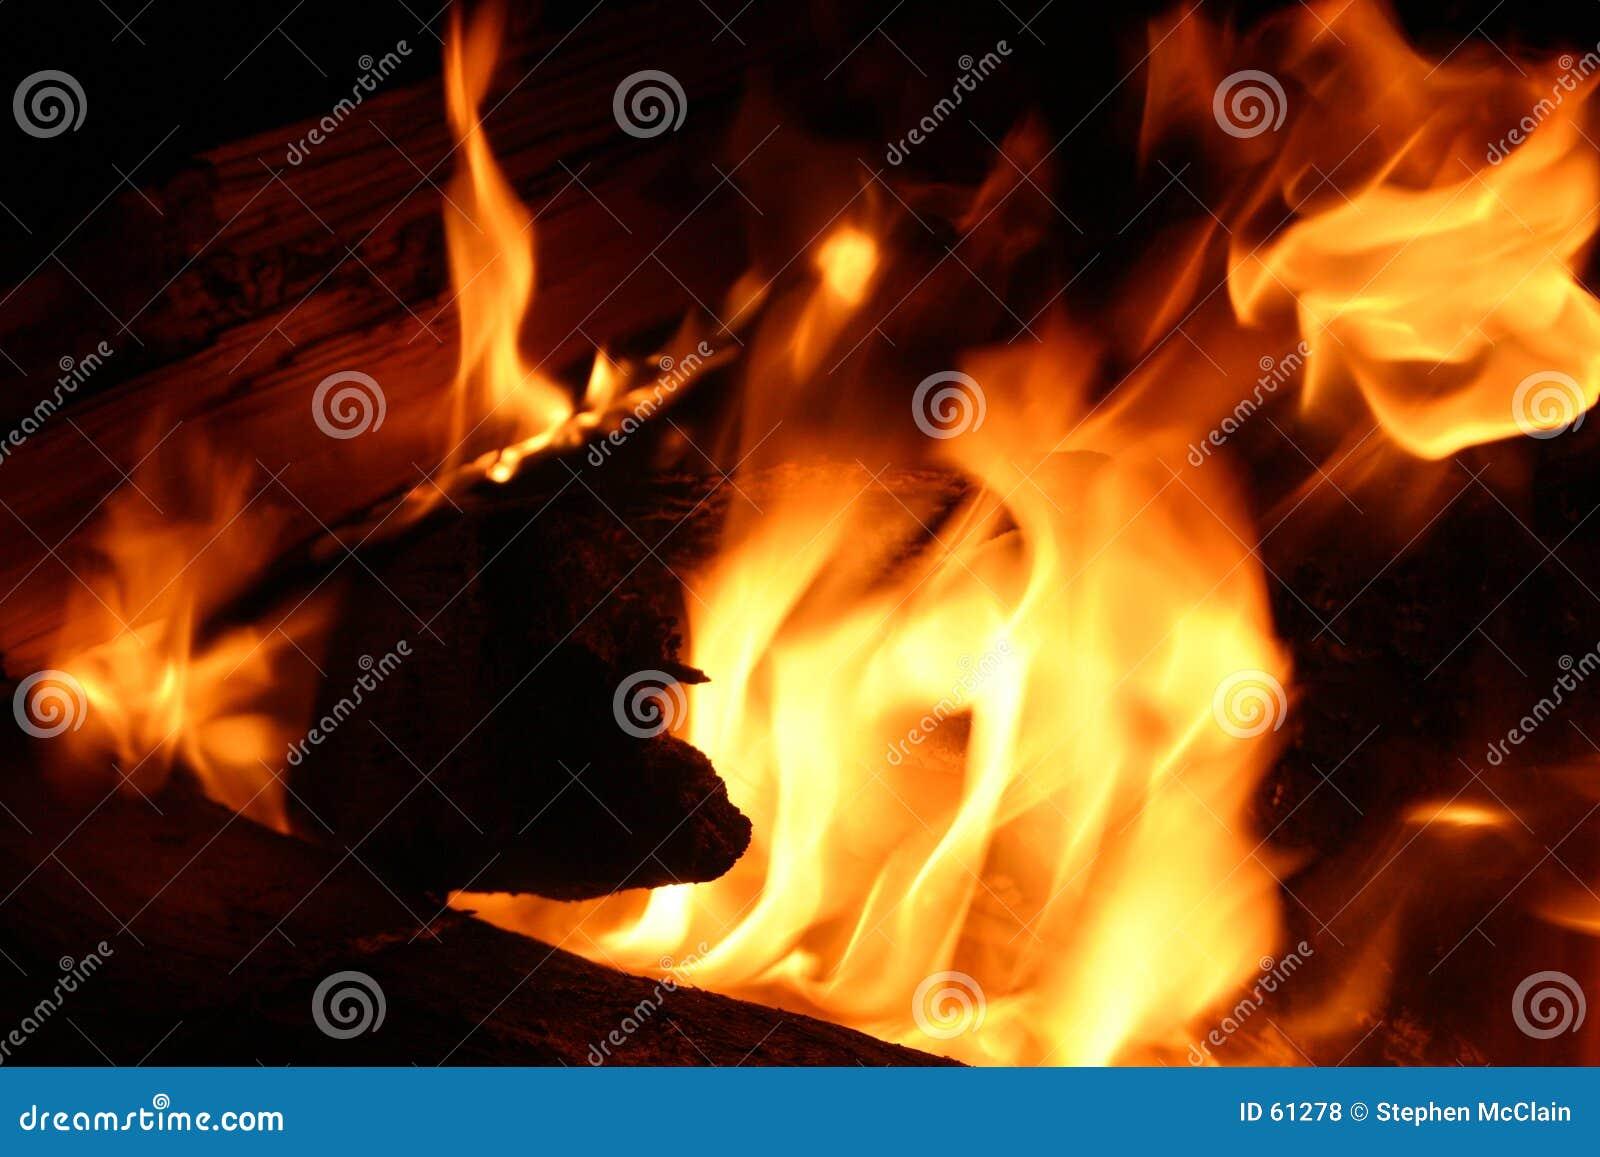 Download πυρκαγιά κινηματογραφήσεων σε πρώτο πλάνο Στοκ Εικόνες - εικόνα από κίνδυνος, κλείστε: 61278